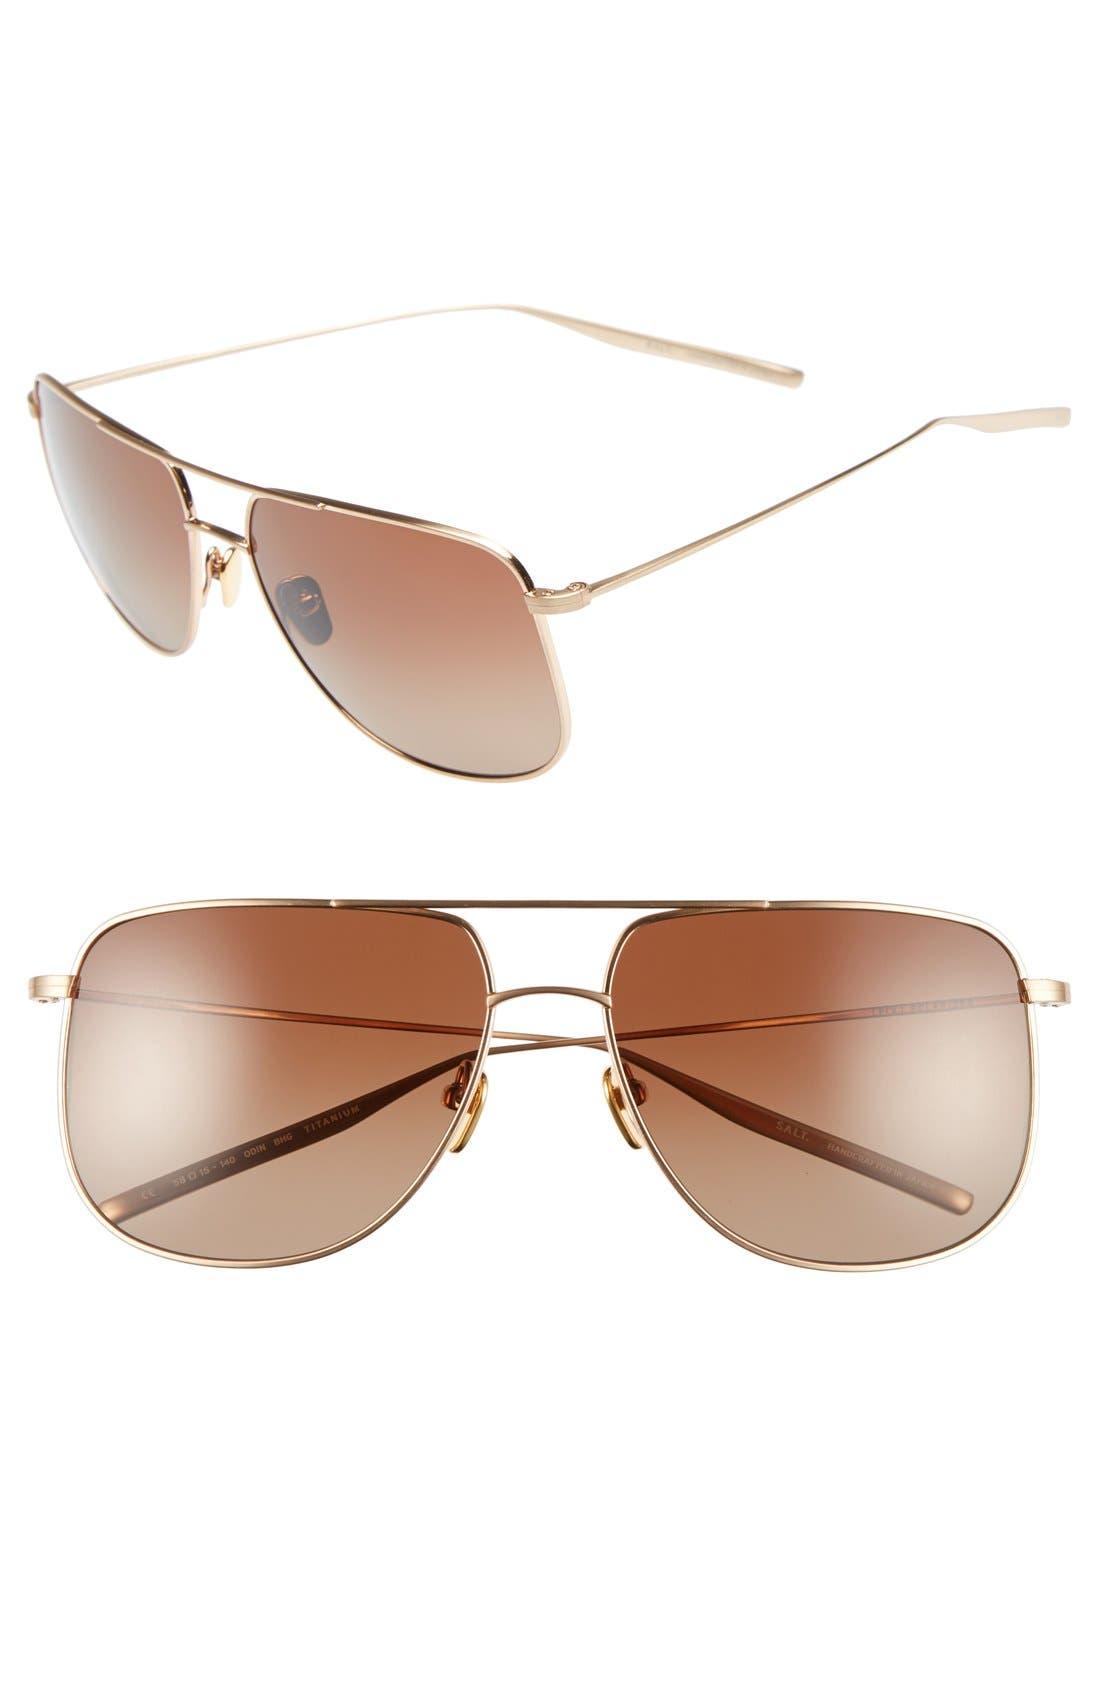 Main Image - SALT 'Odin' 58mm Polarized Sunglasses